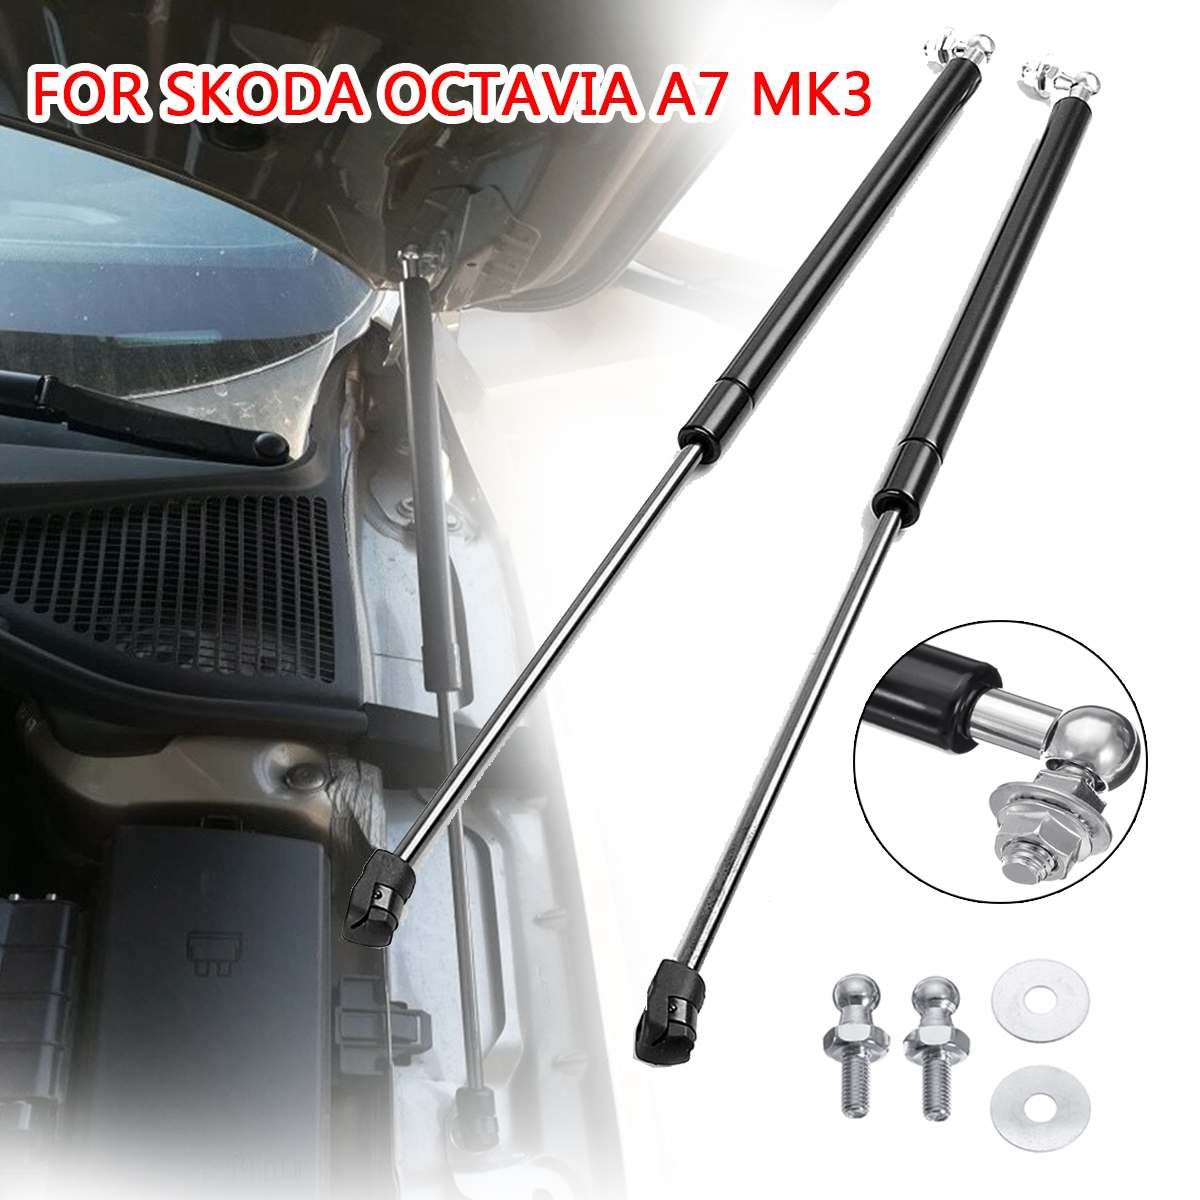 2Pcs Car Rear Ammortizzatore a Gas Ascensore Supporto Ammortizzatore Tipo Mcpherson Ammortizzatore Cofano per Skoda Octavia A7 MK3